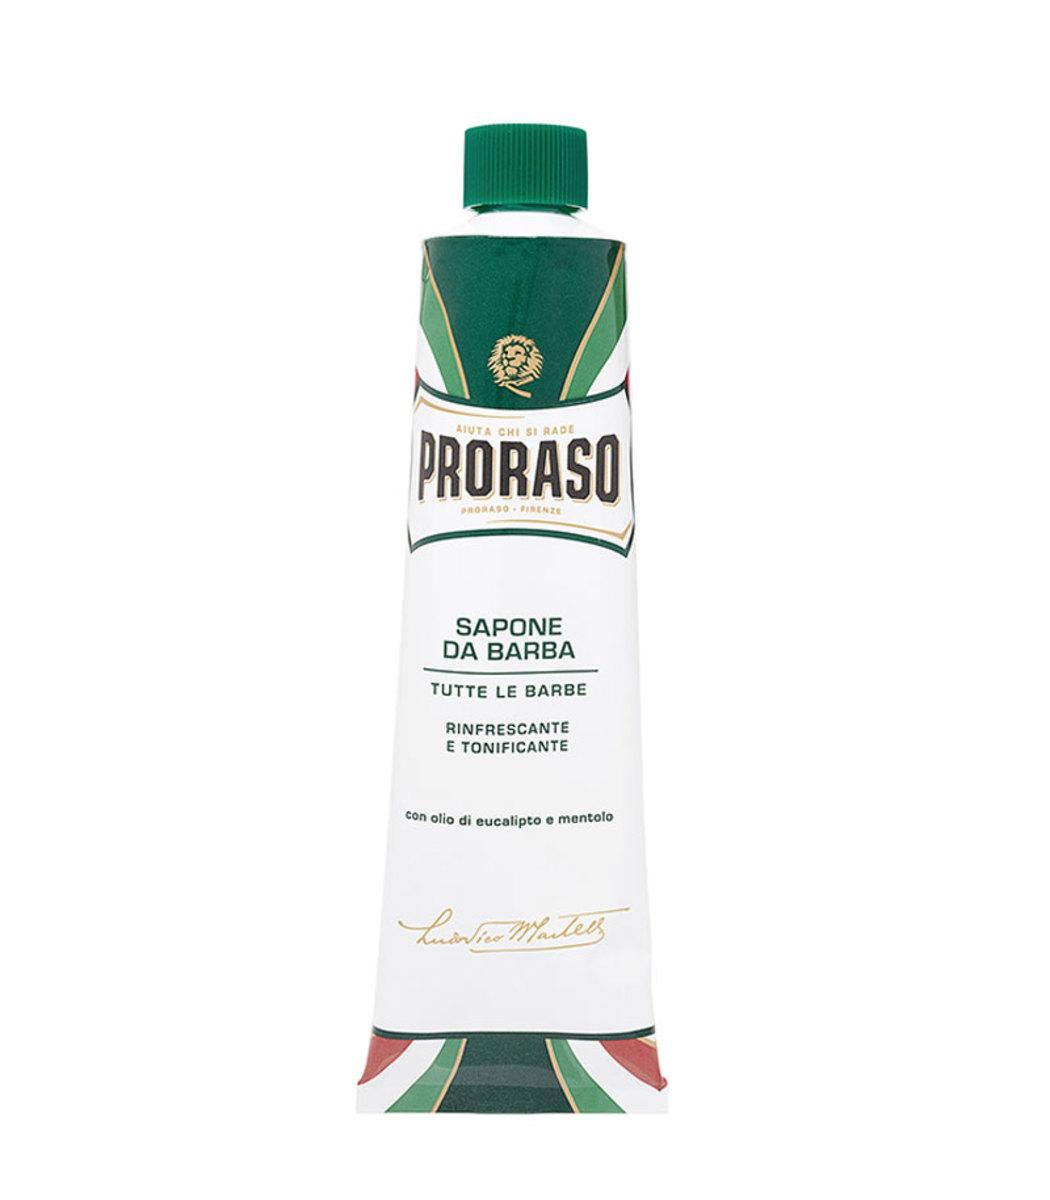 Proraso Shaving Cream Tube Refresh In N/a